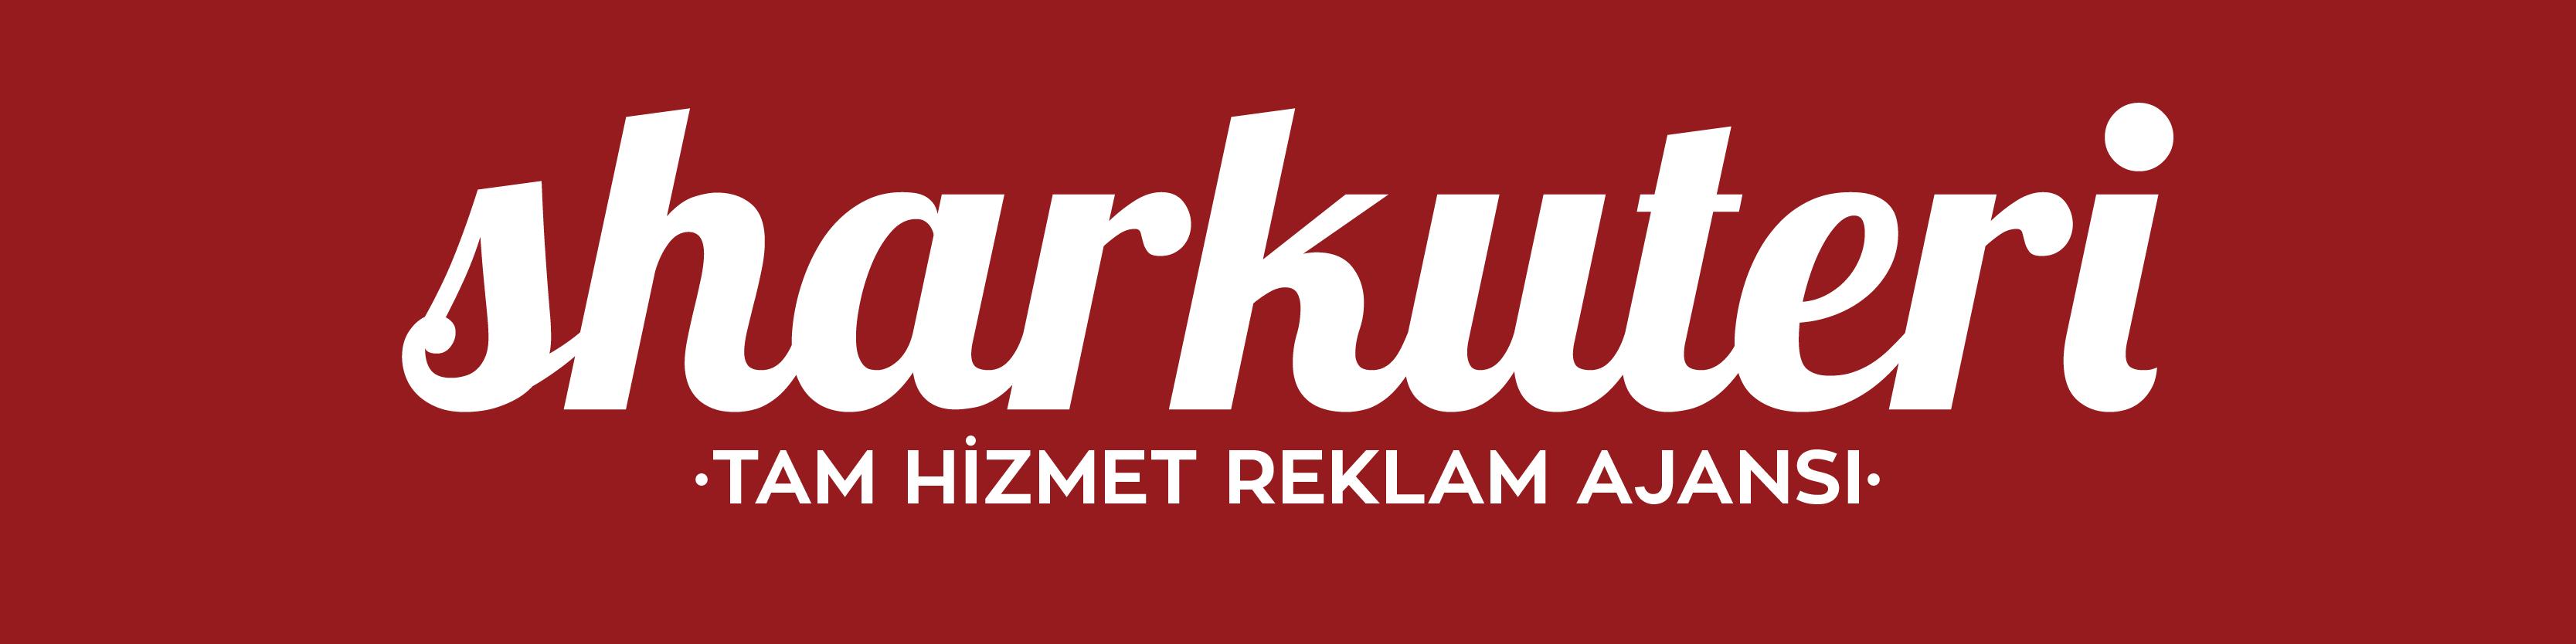 Sharkuteri Medya  banner fotograf